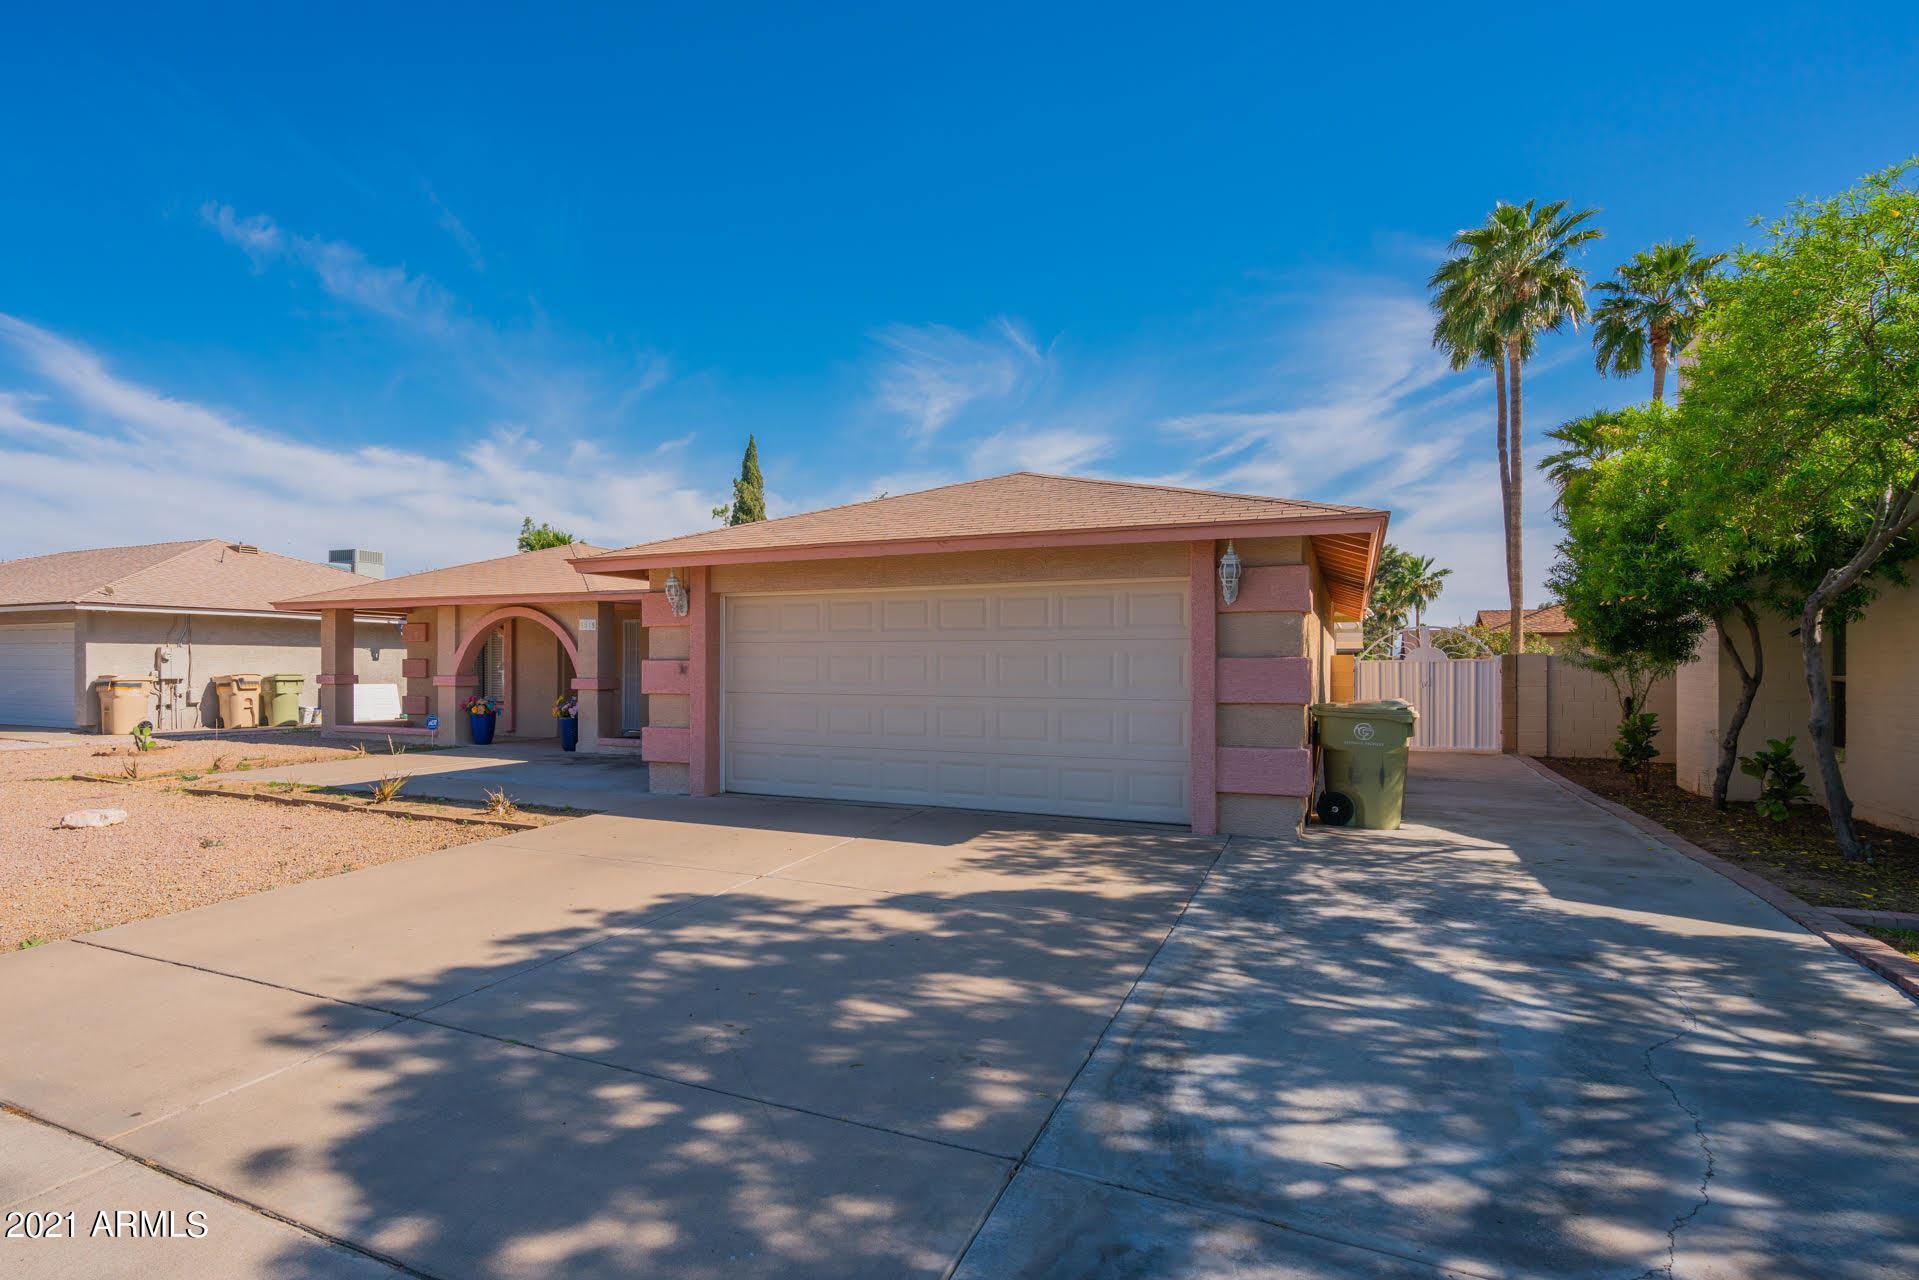 5519 W BERYL Avenue, Glendale, AZ 85302 - #: 6227166